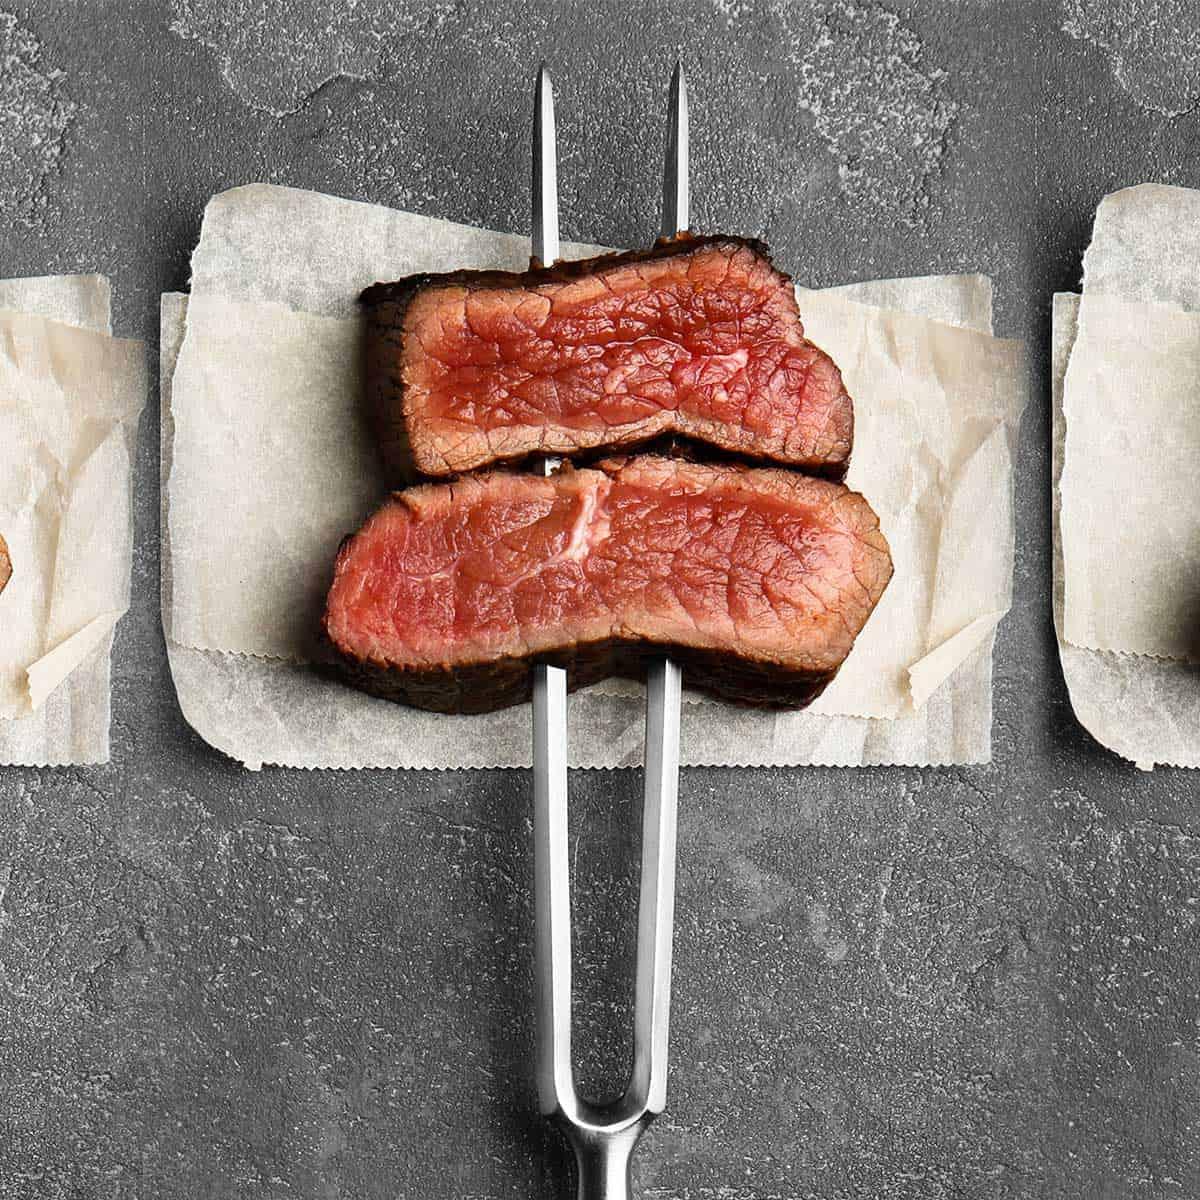 Medium rare steak on a beef fork